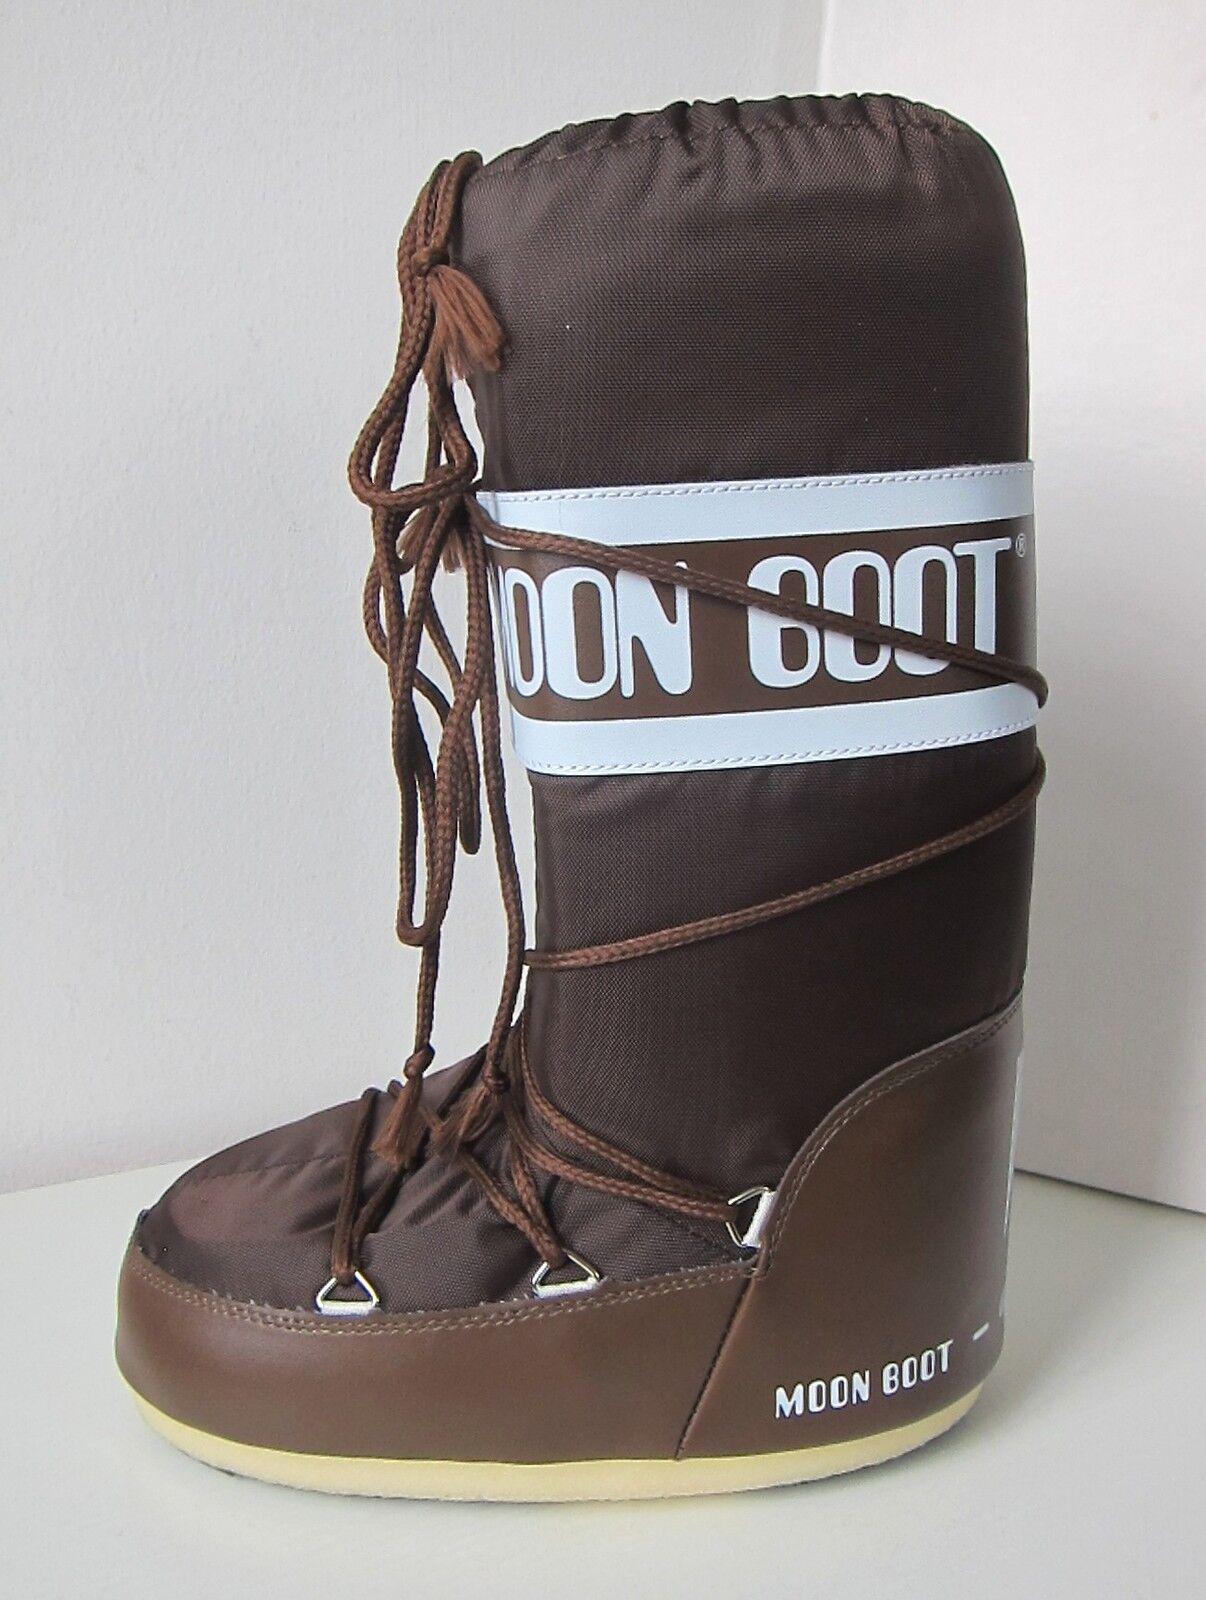 Tecnica Moon Boot nylon marrón /34 Moon Boots Moonboots Marrone Brown